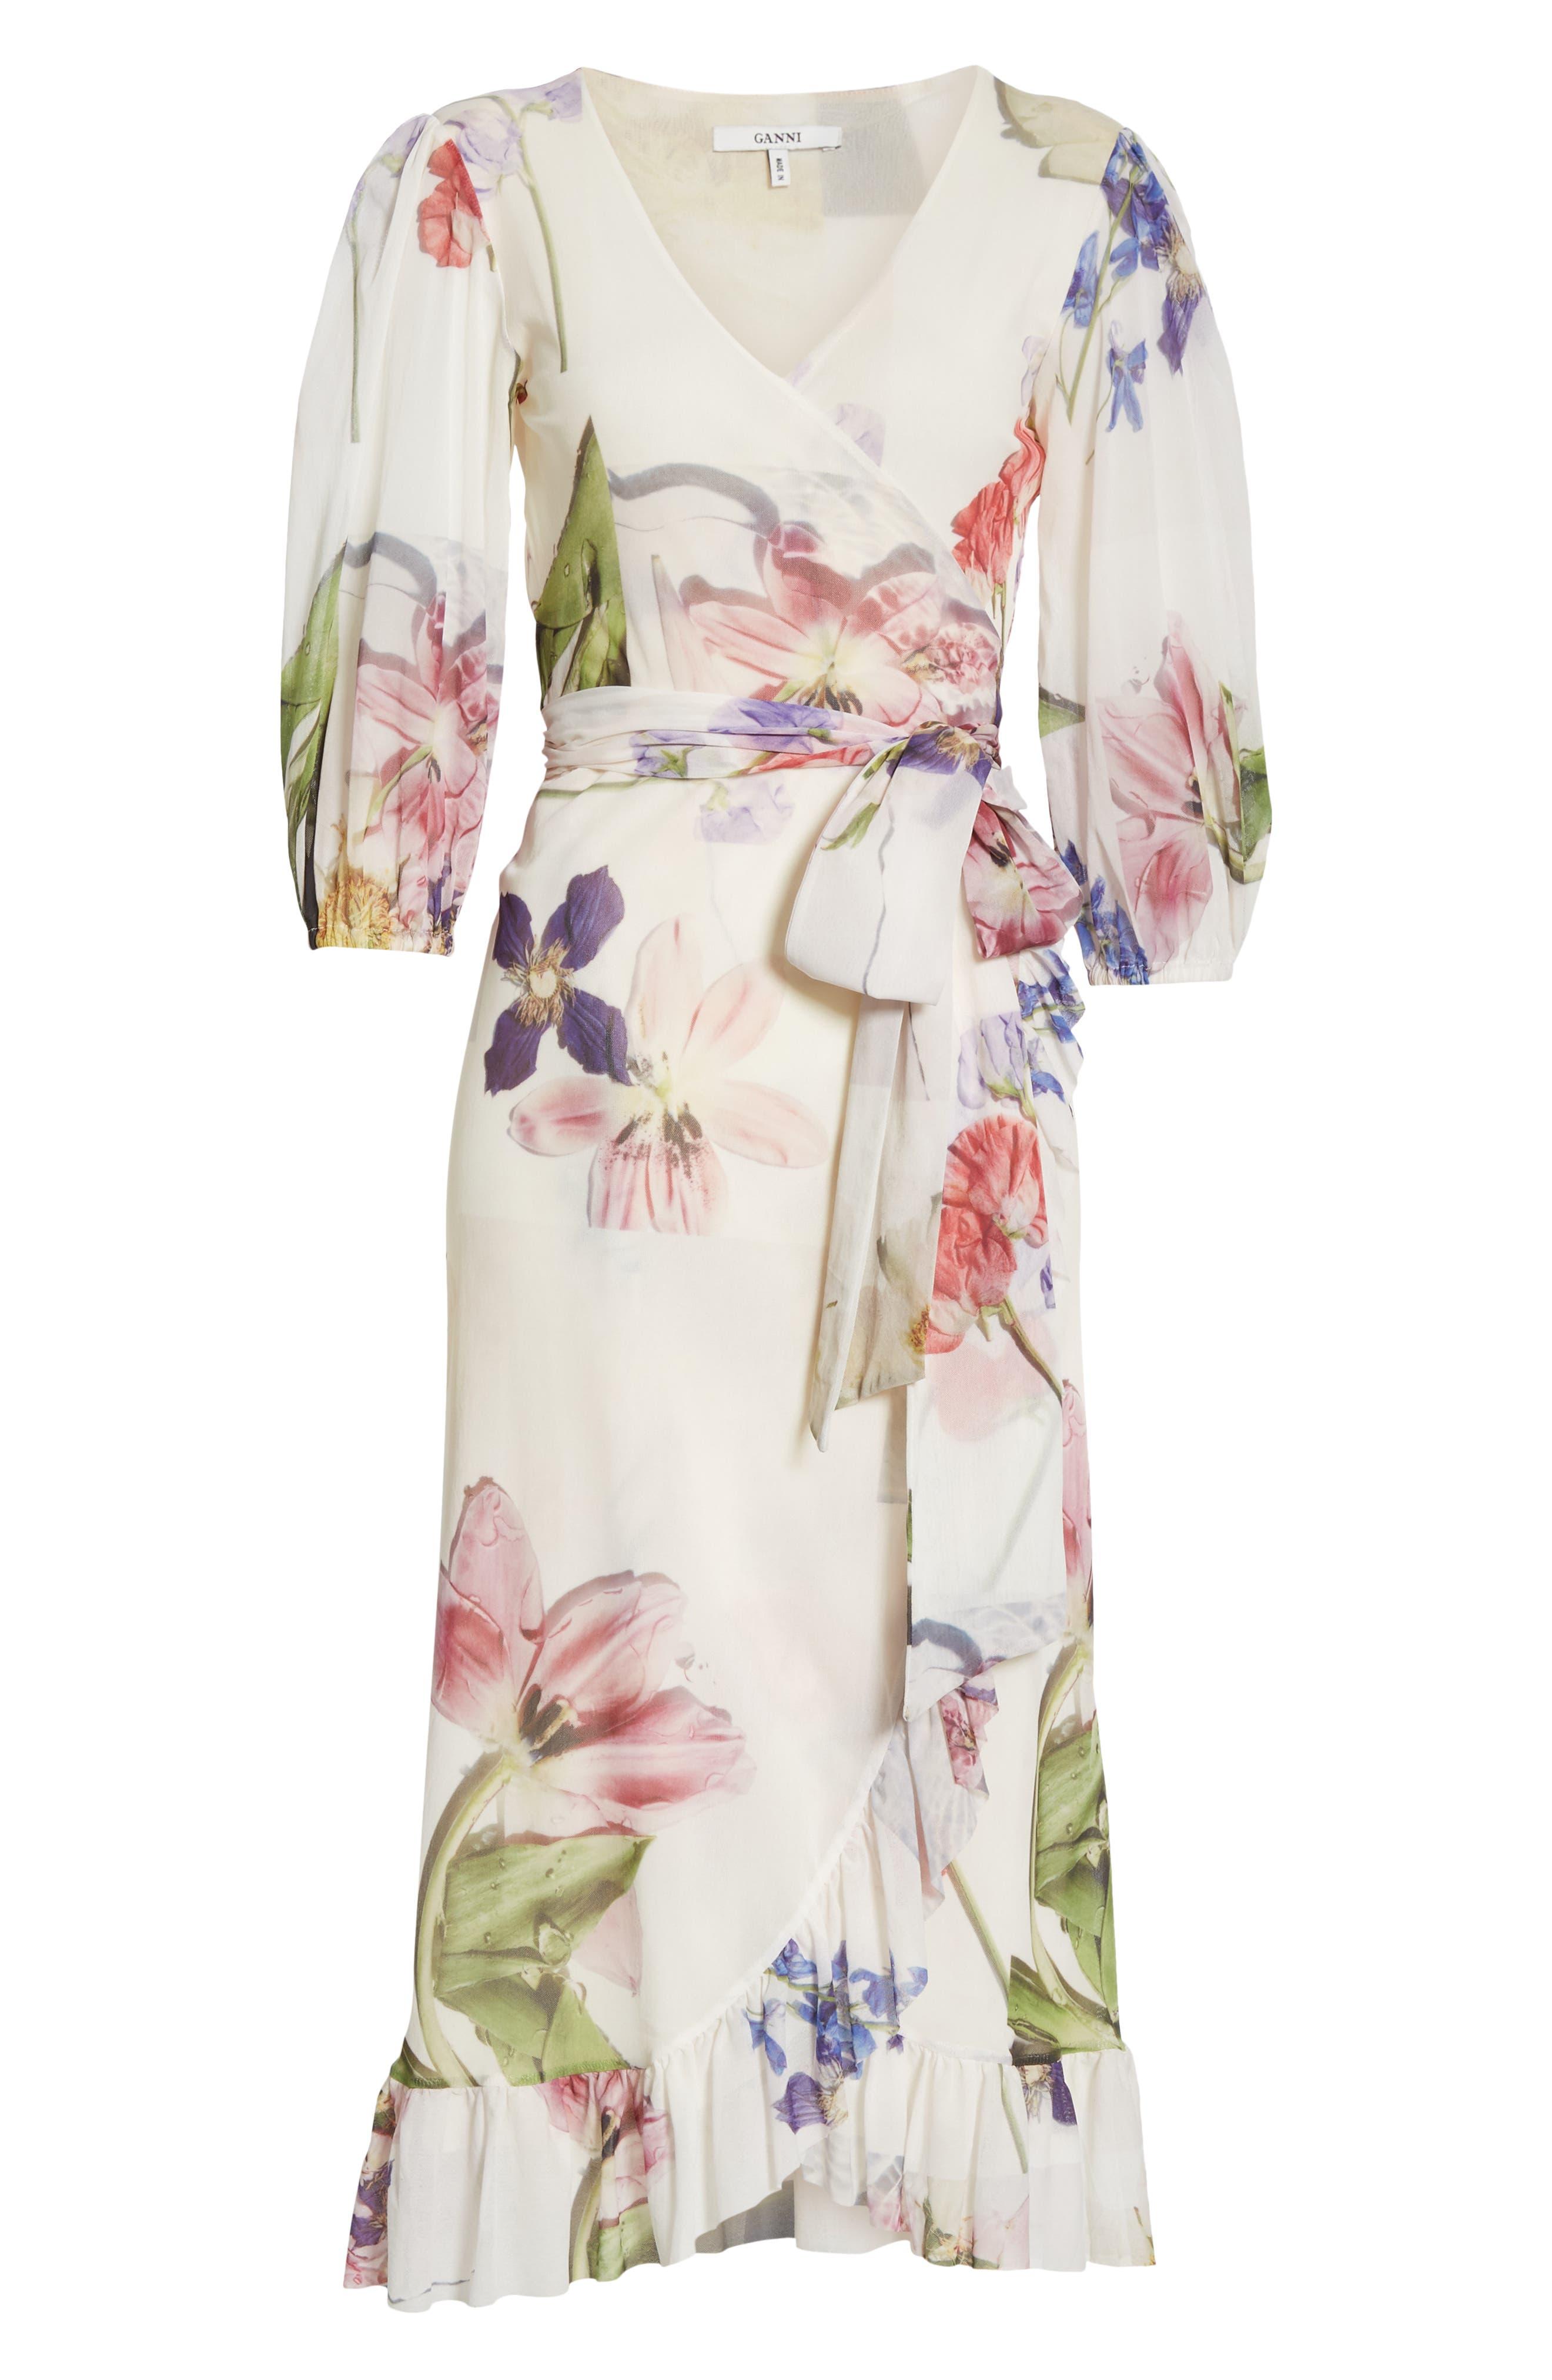 GANNI,                             Floral Print Mesh Dress,                             Alternate thumbnail 7, color,                             BRIGHT WHITE